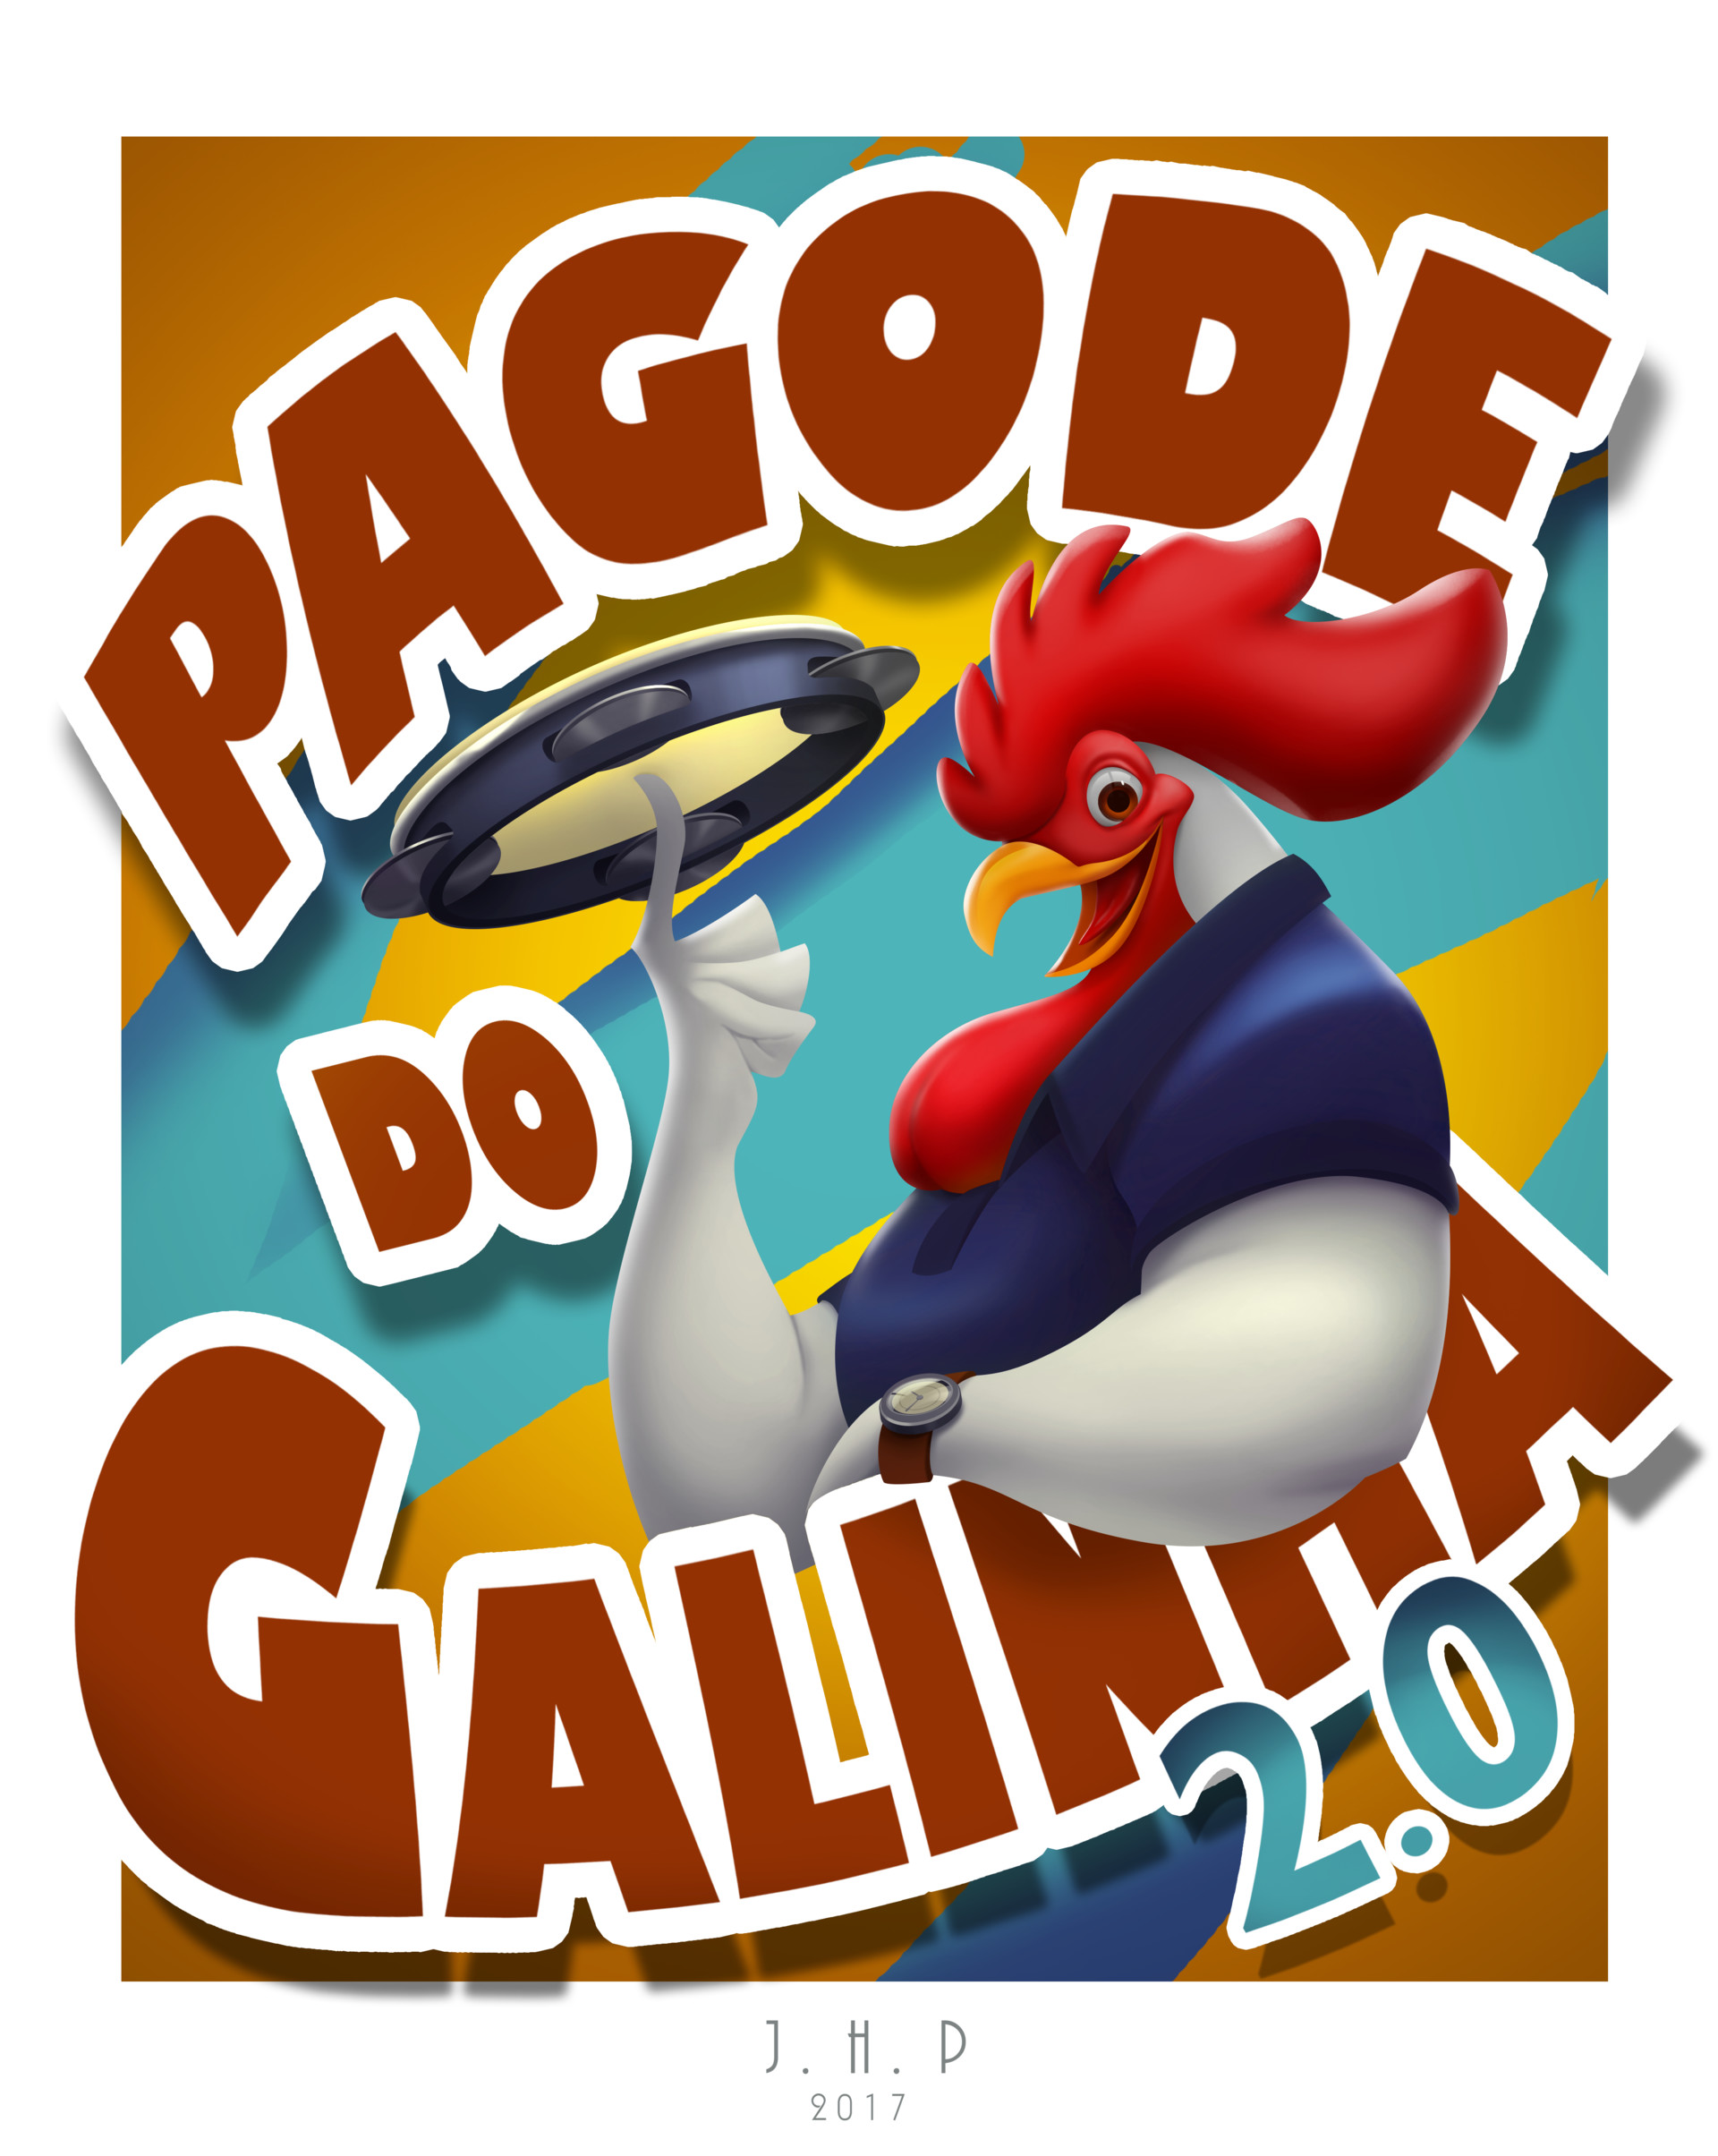 Joao henrique pacheco pagode chicken postar